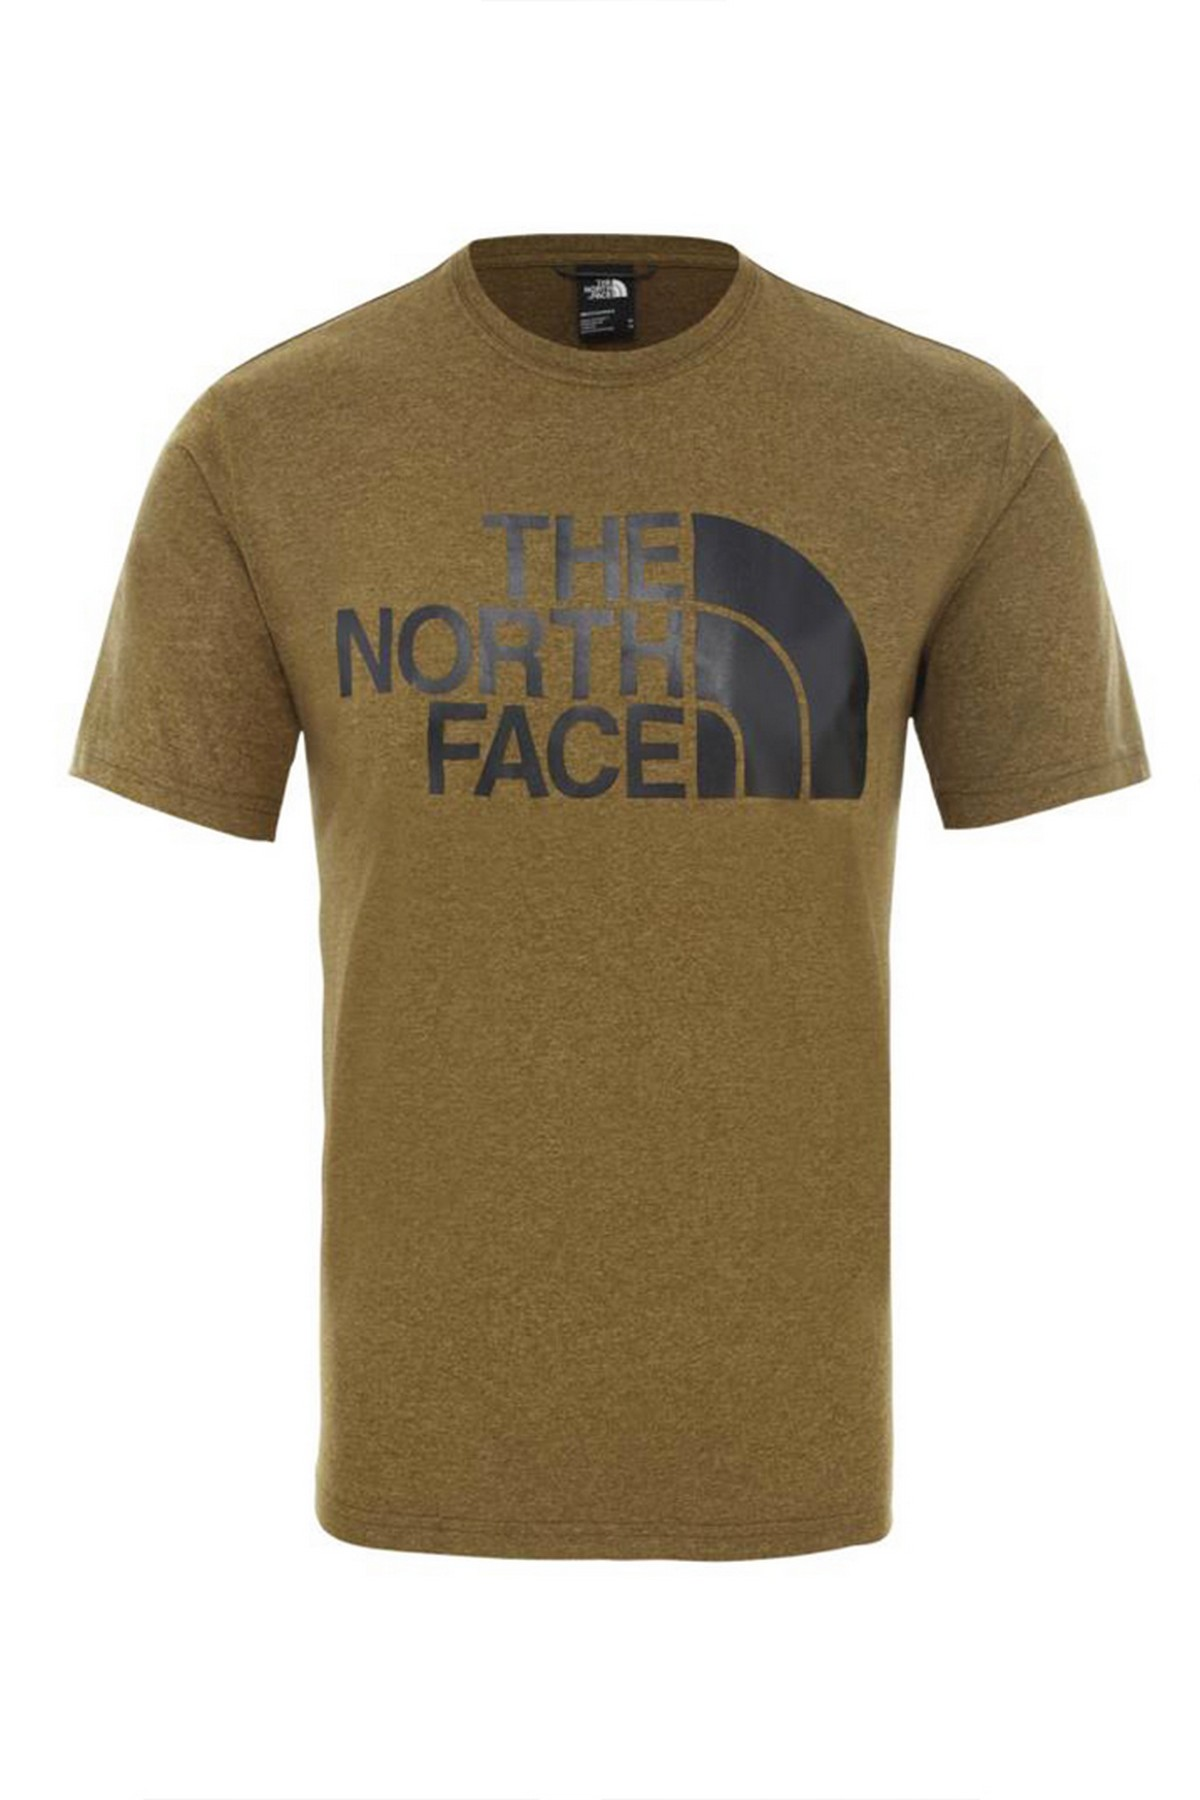 The North Face Reaxion Easy Erkek T-Shirt - Yeşil (NF0A4CDVHSD1SS)